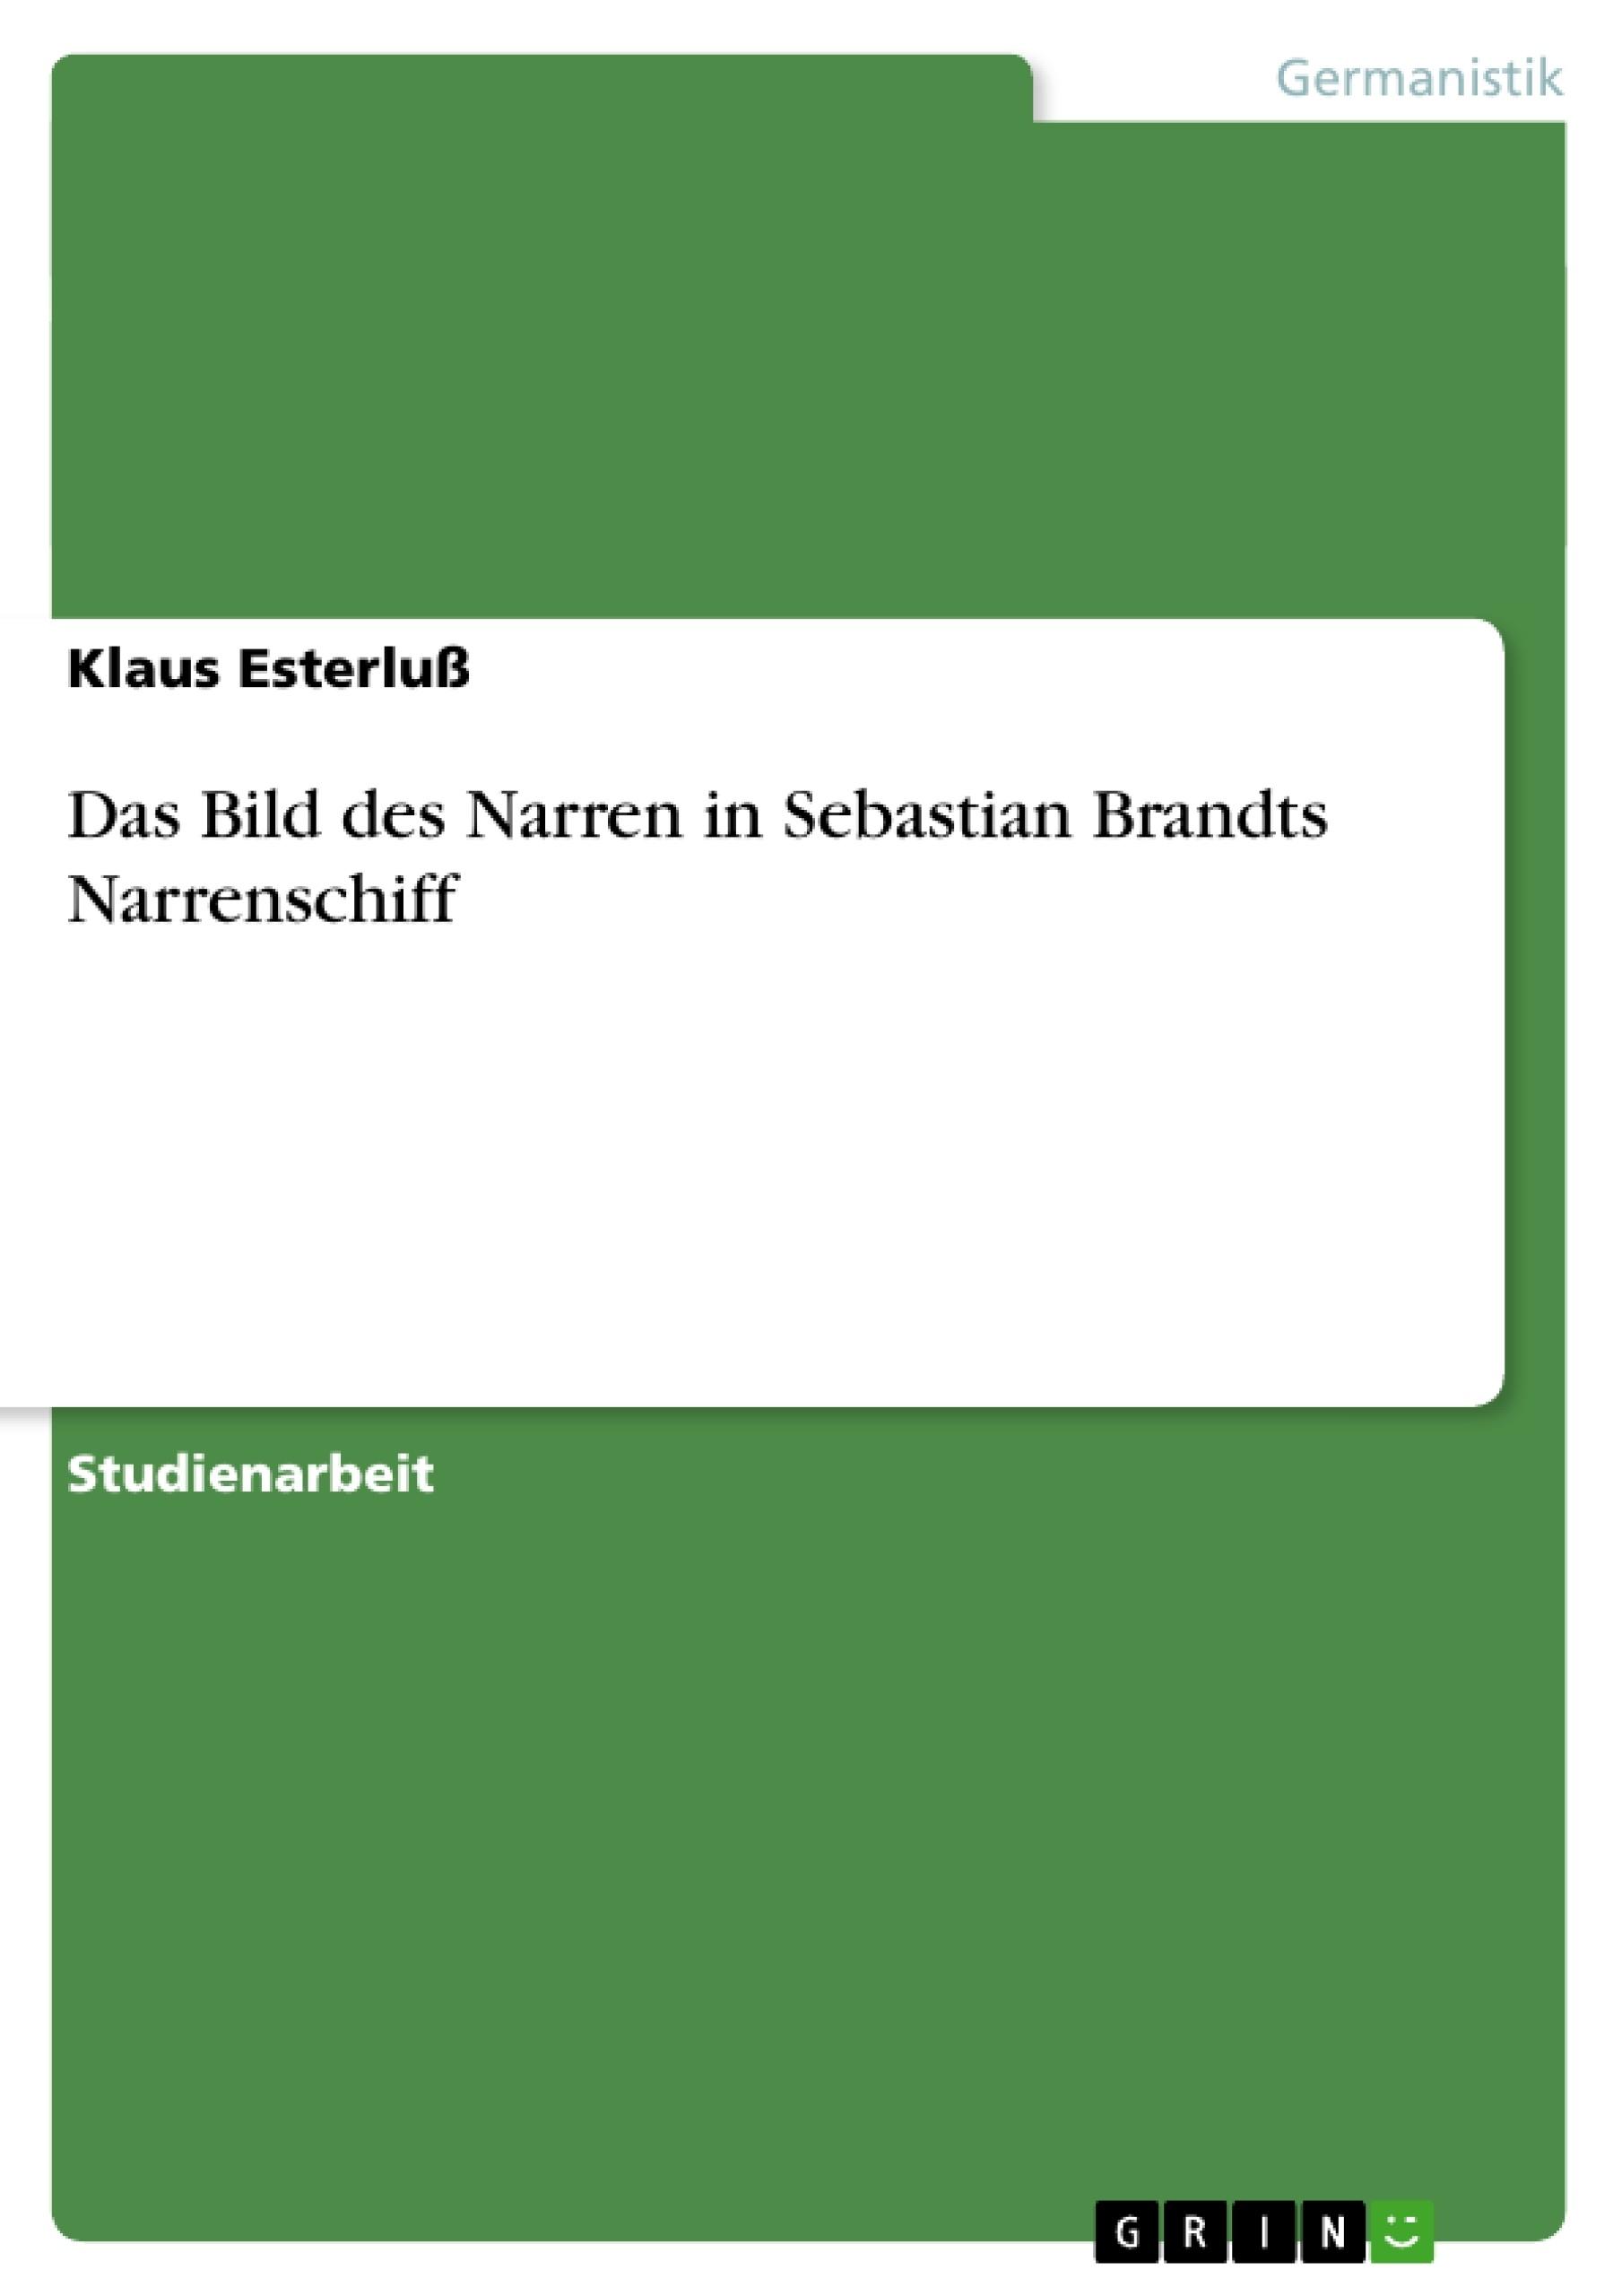 Titel: Das Bild des Narren in Sebastian Brandts Narrenschiff